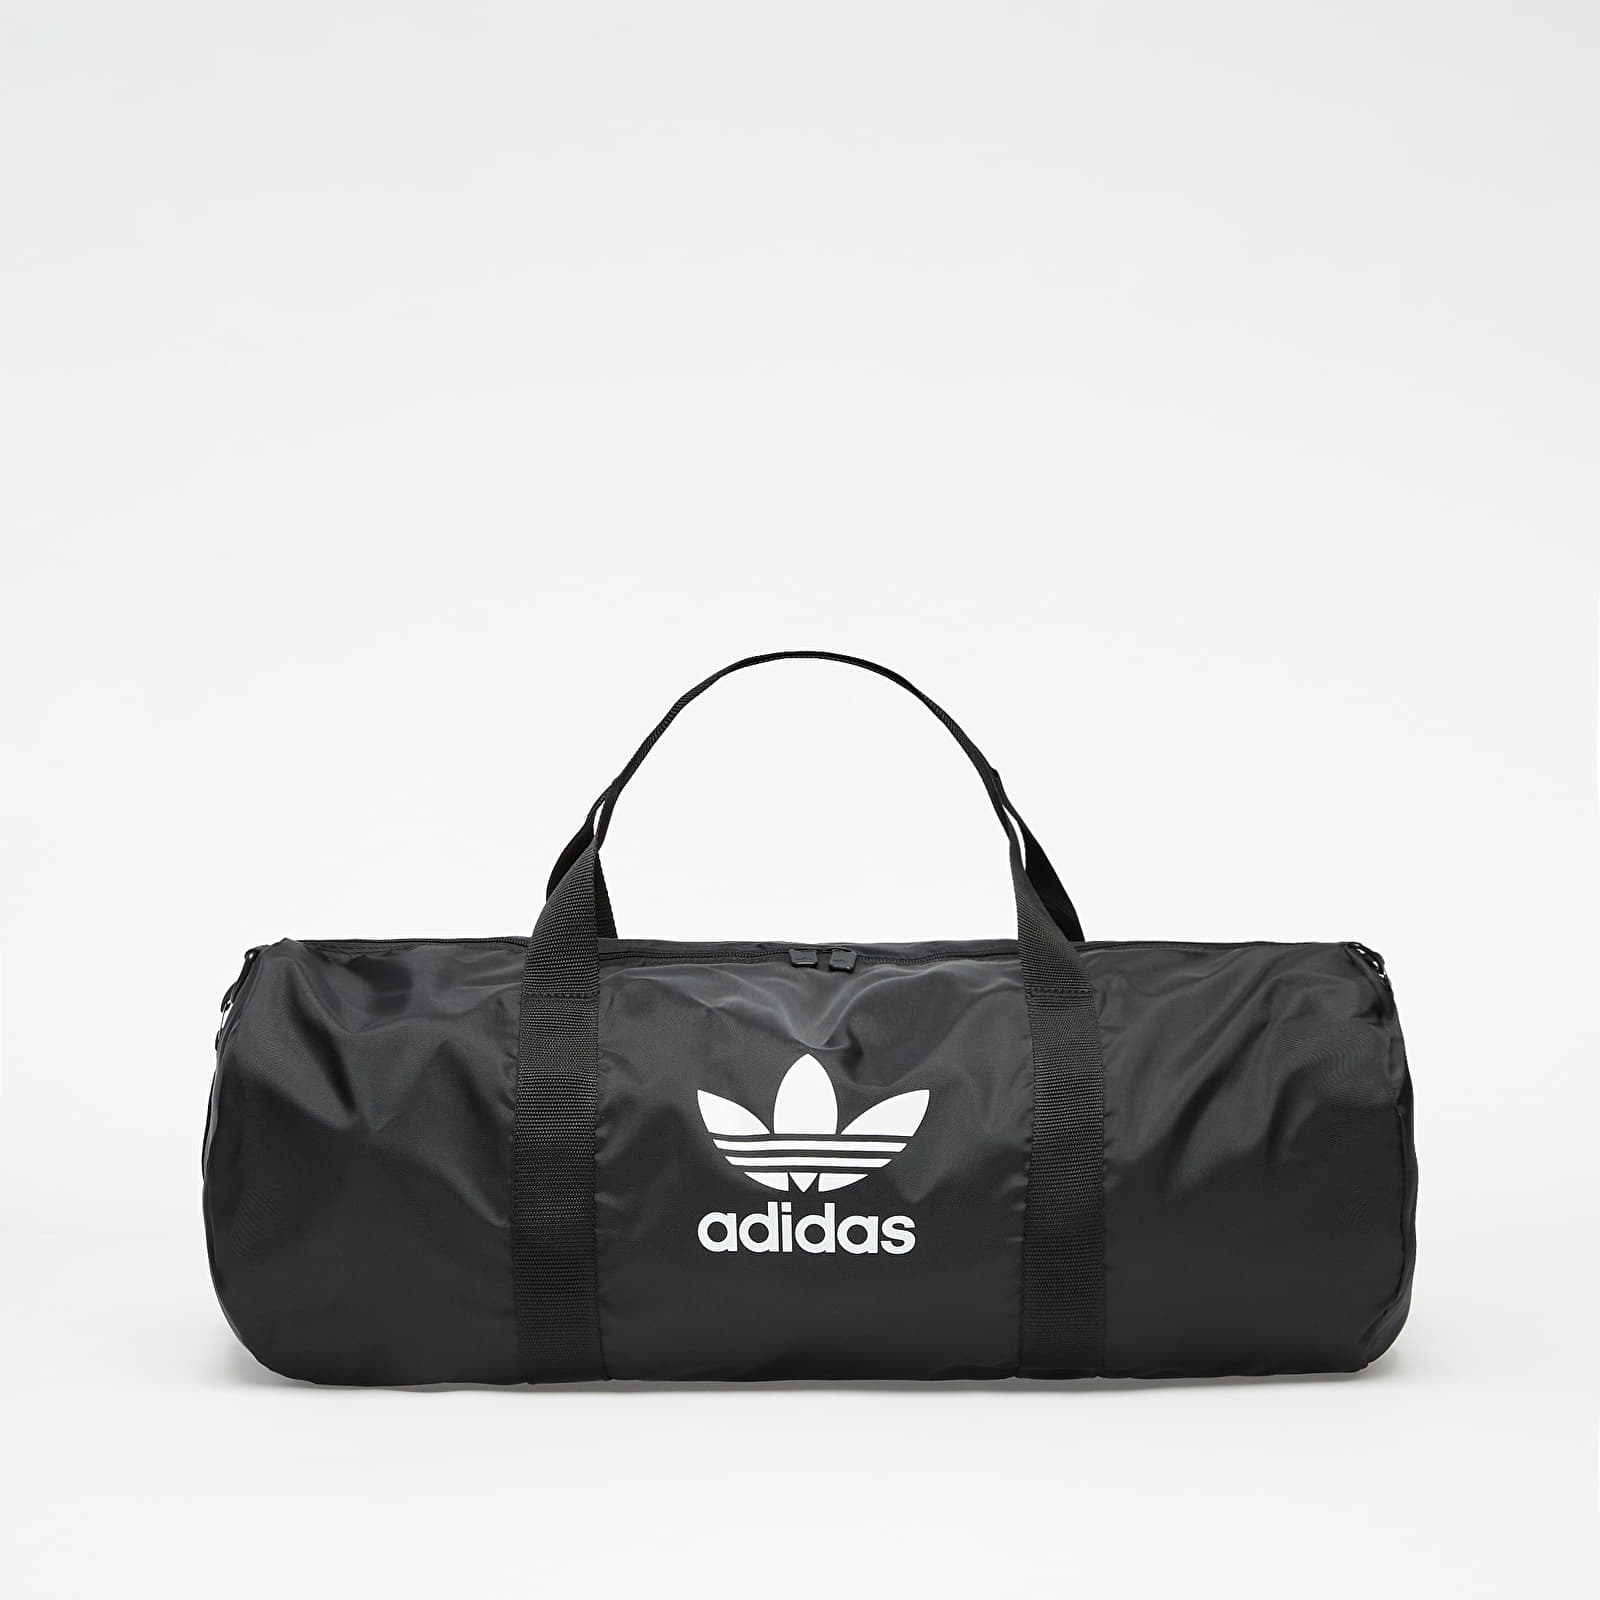 adidas Originals Adicolor Duffel Bag Black Universal